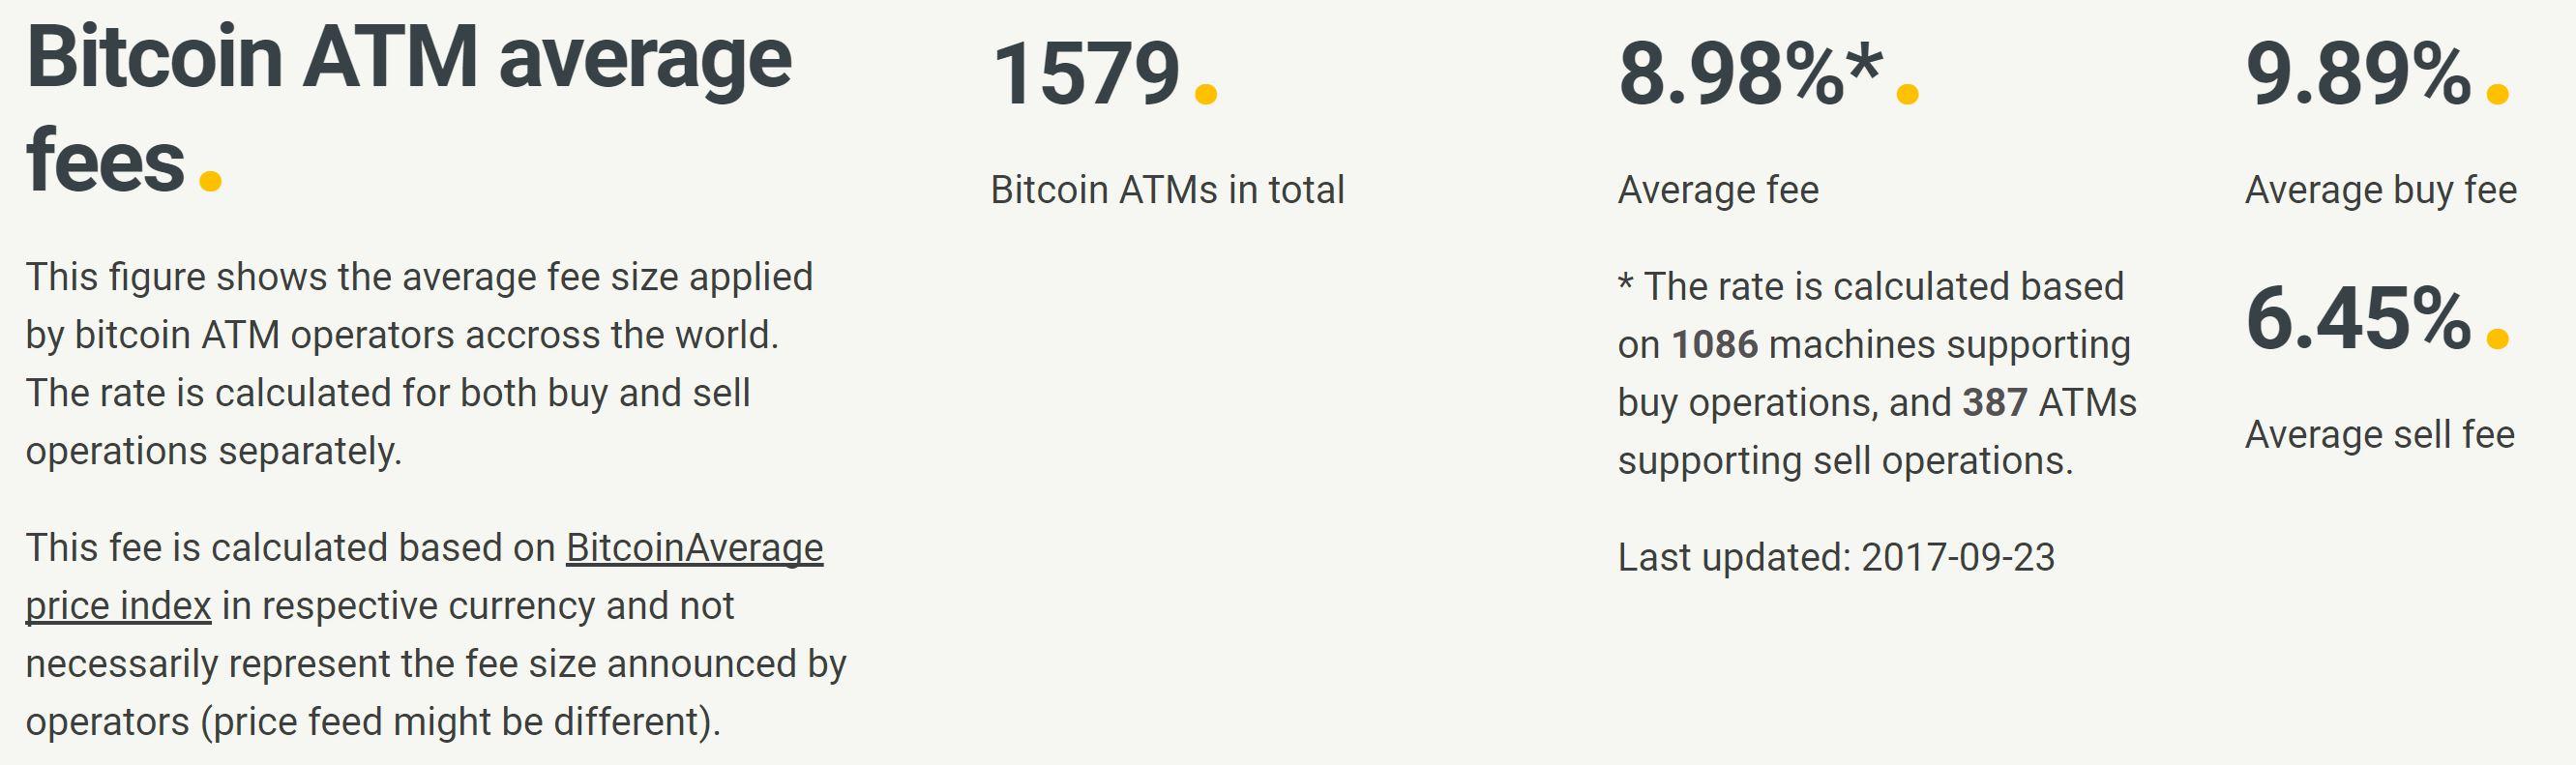 Does Bitcoin/Blockchain make sense for international money transfer?